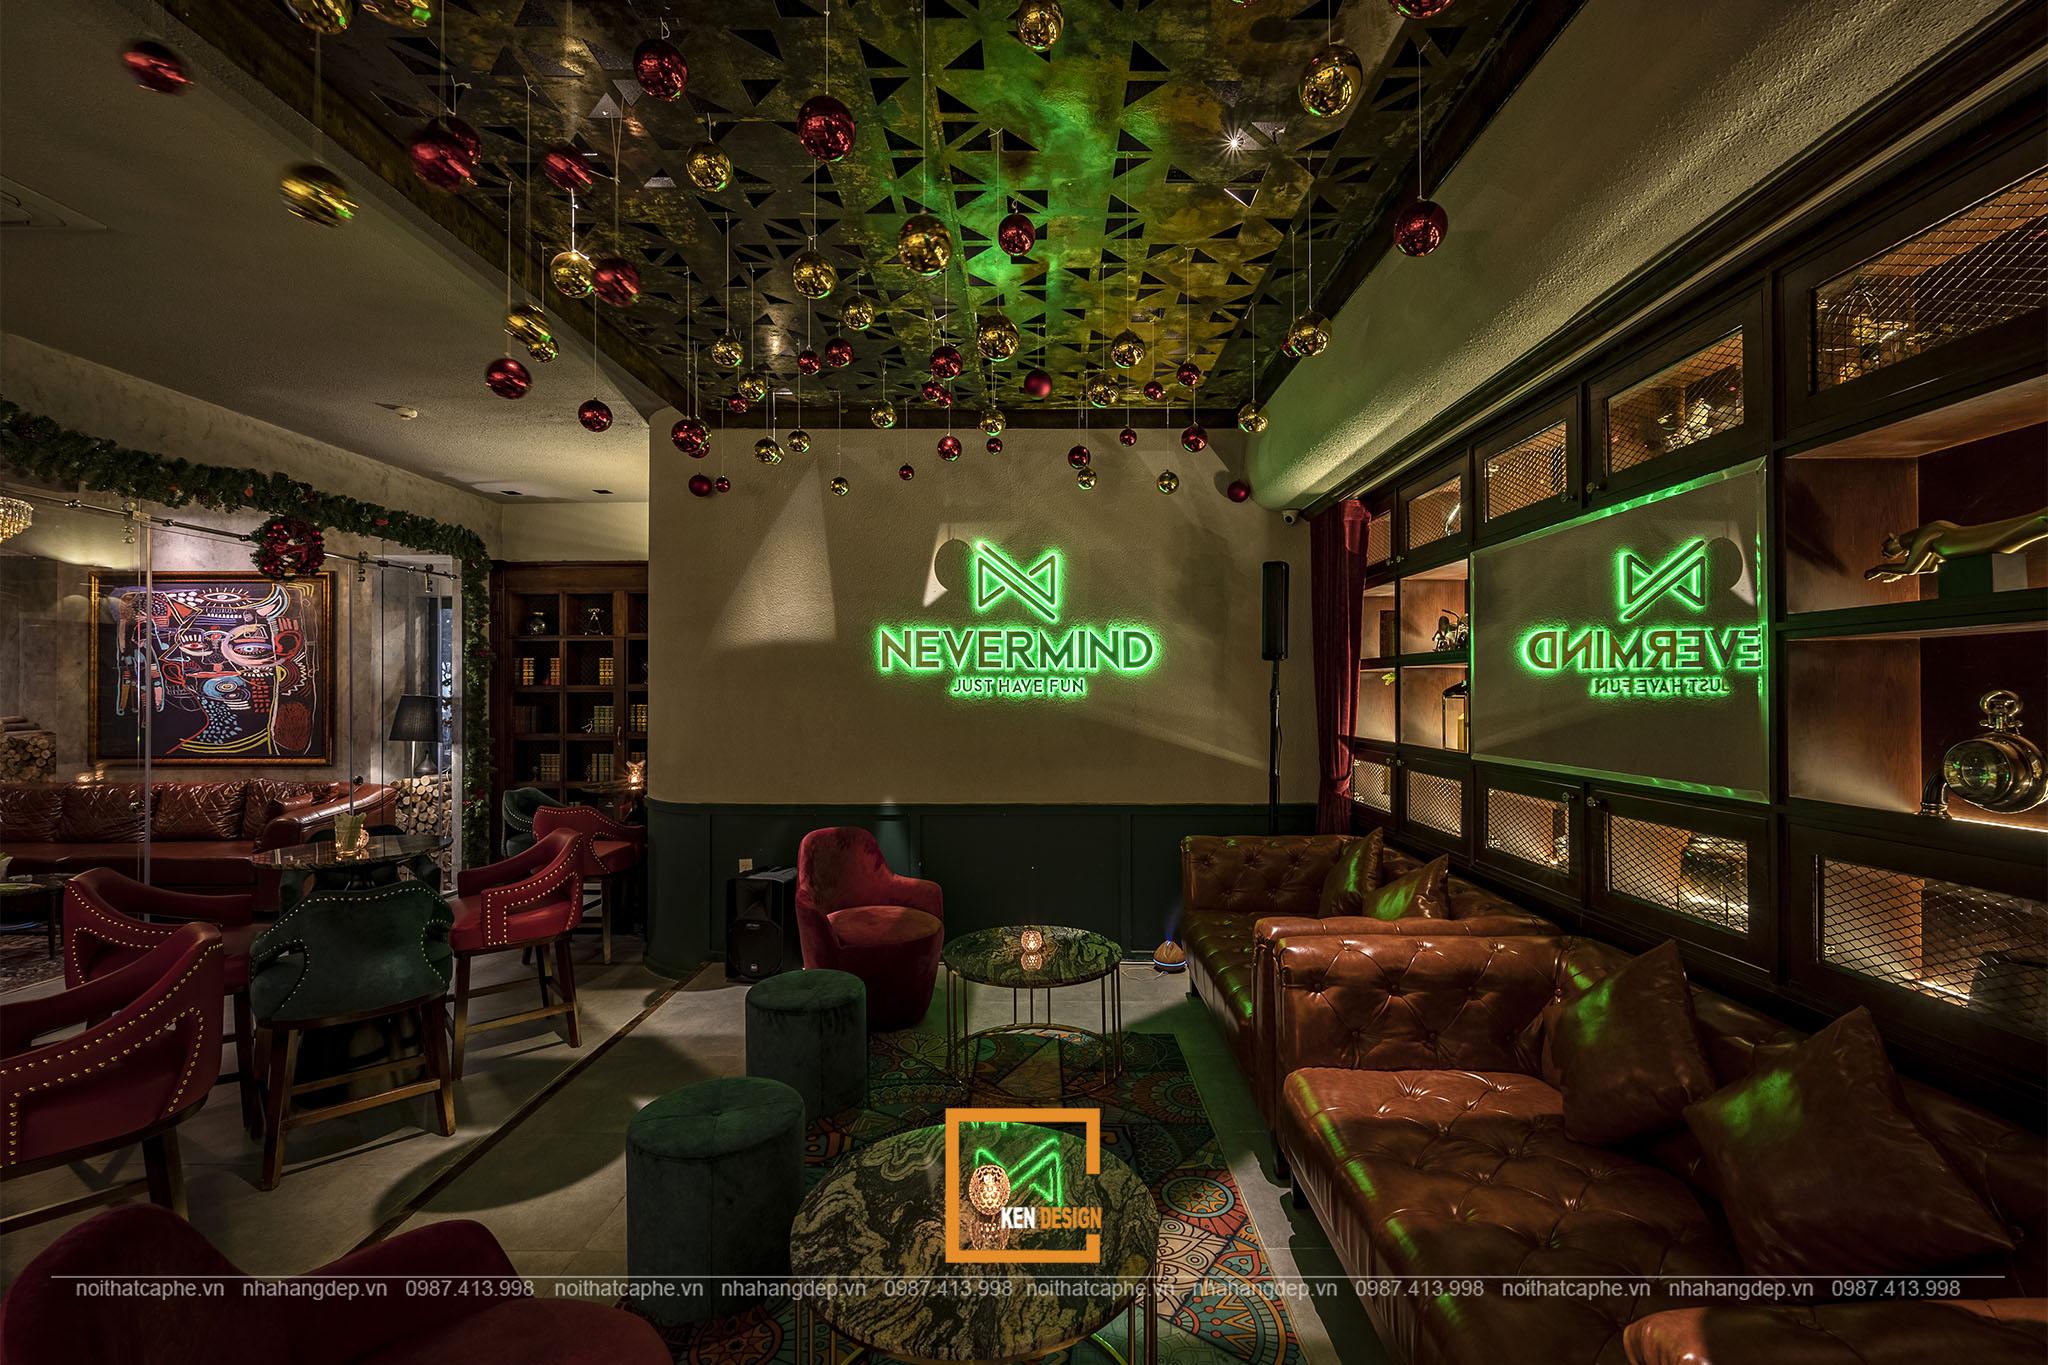 Mẫu thiết kế Nevermind Bar Lounge